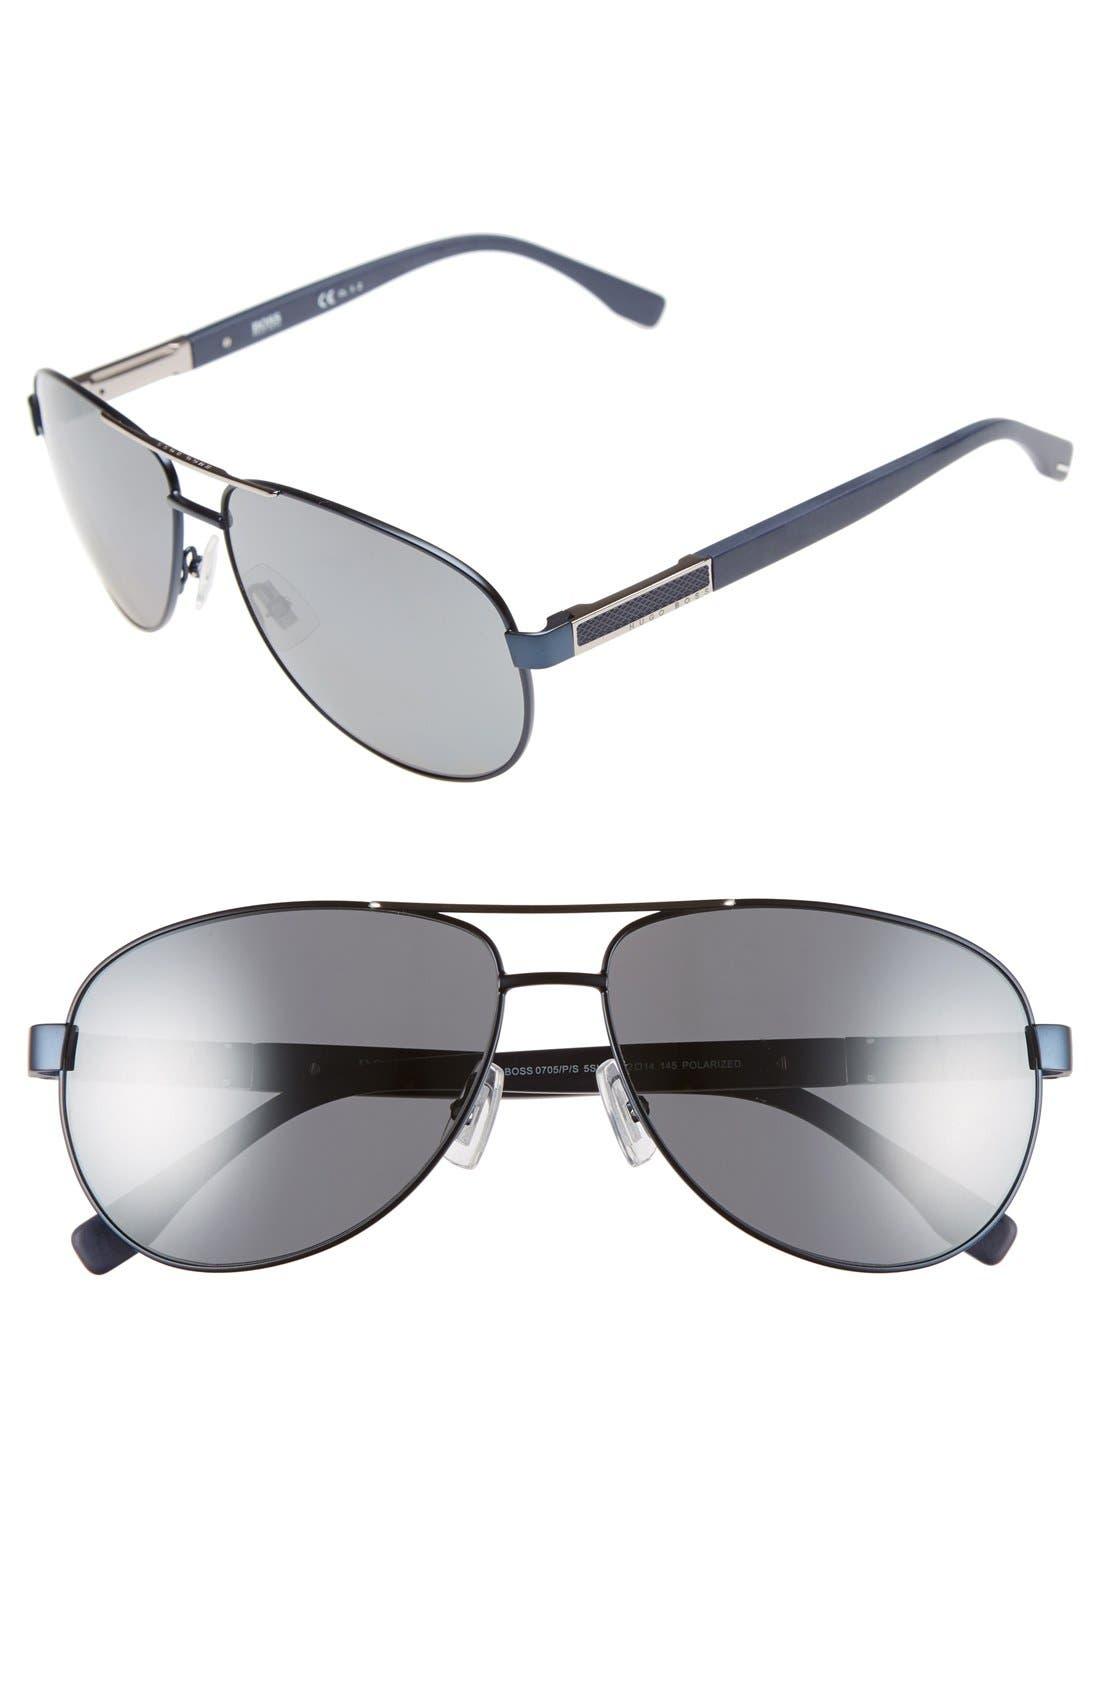 62mm Polarized Aviator Sunglasses,                             Main thumbnail 3, color,